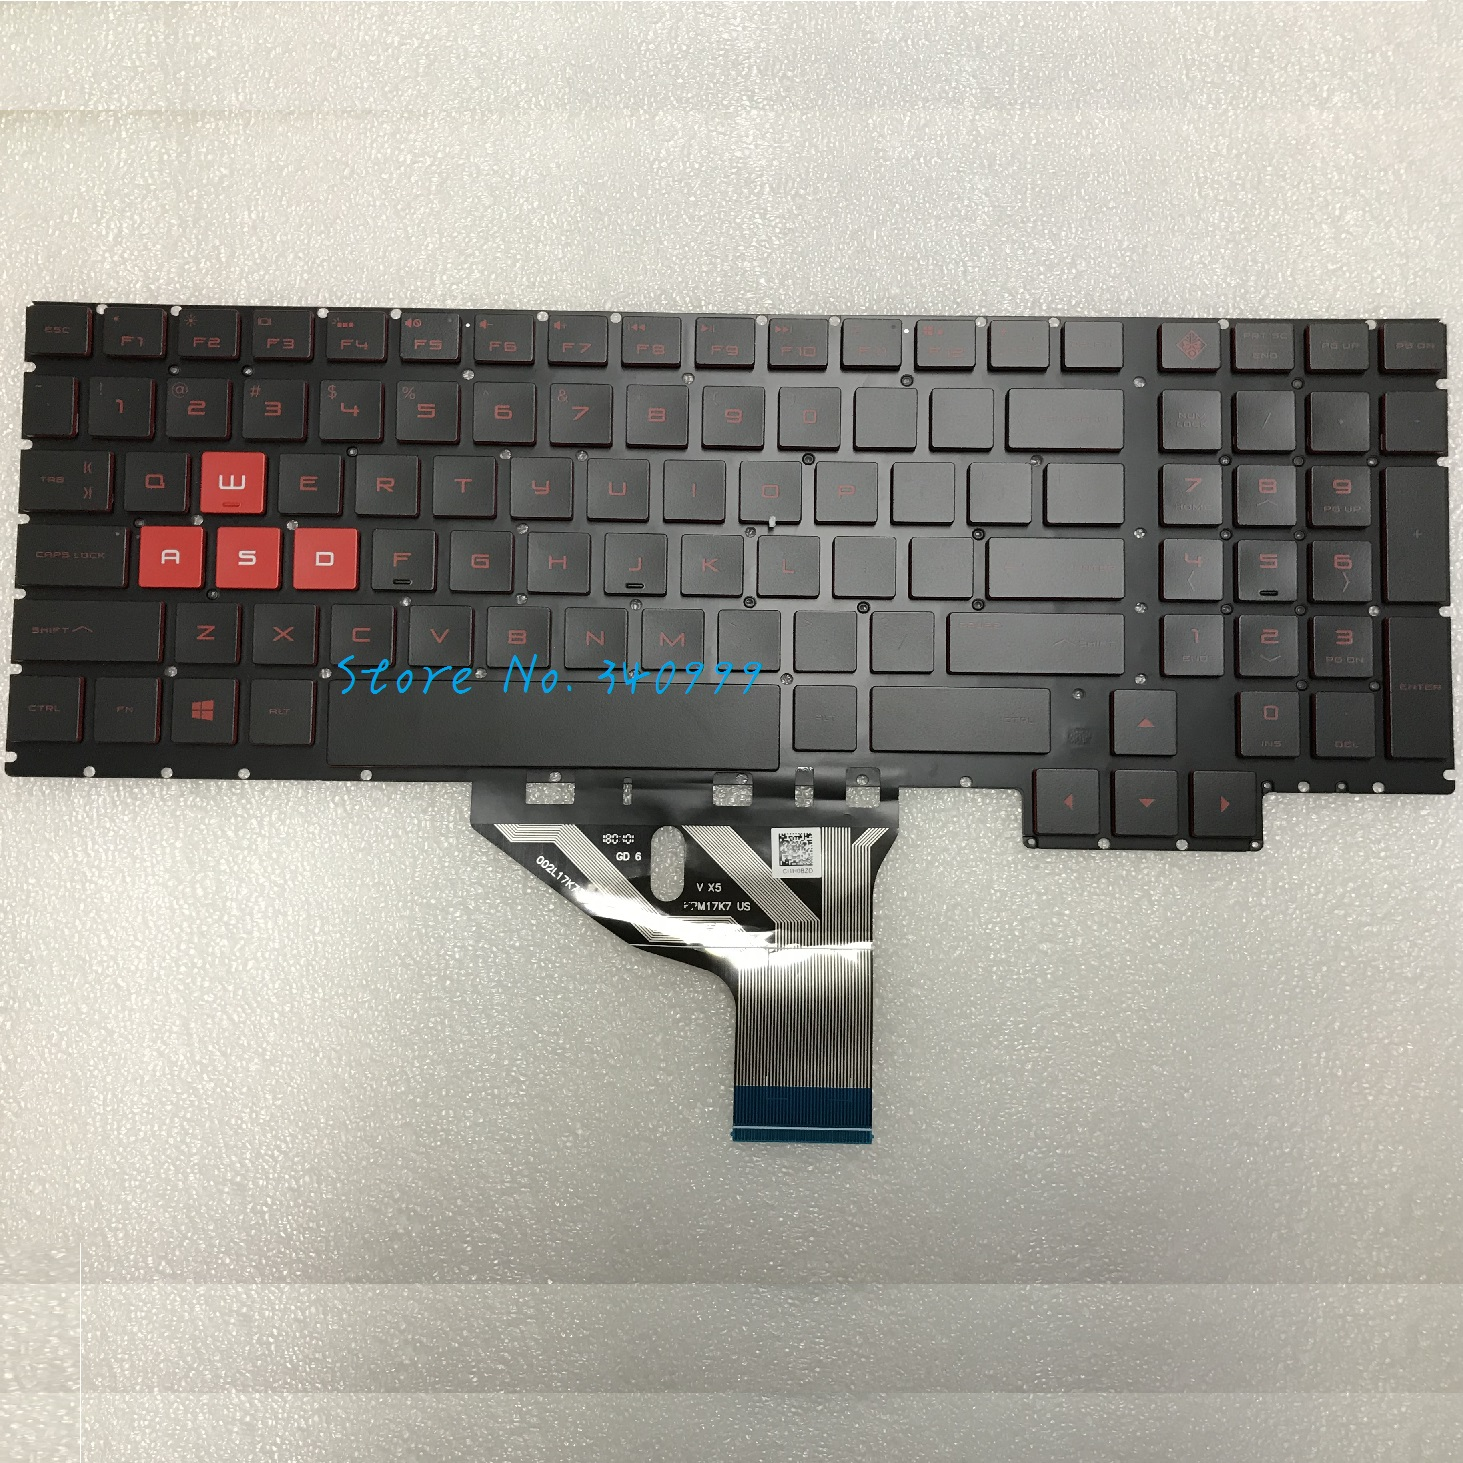 New HP Omen 15-CE 15-CE010CA 15-CE020CA 15-CE030CA 15-CE051NR Backlit Keyboard